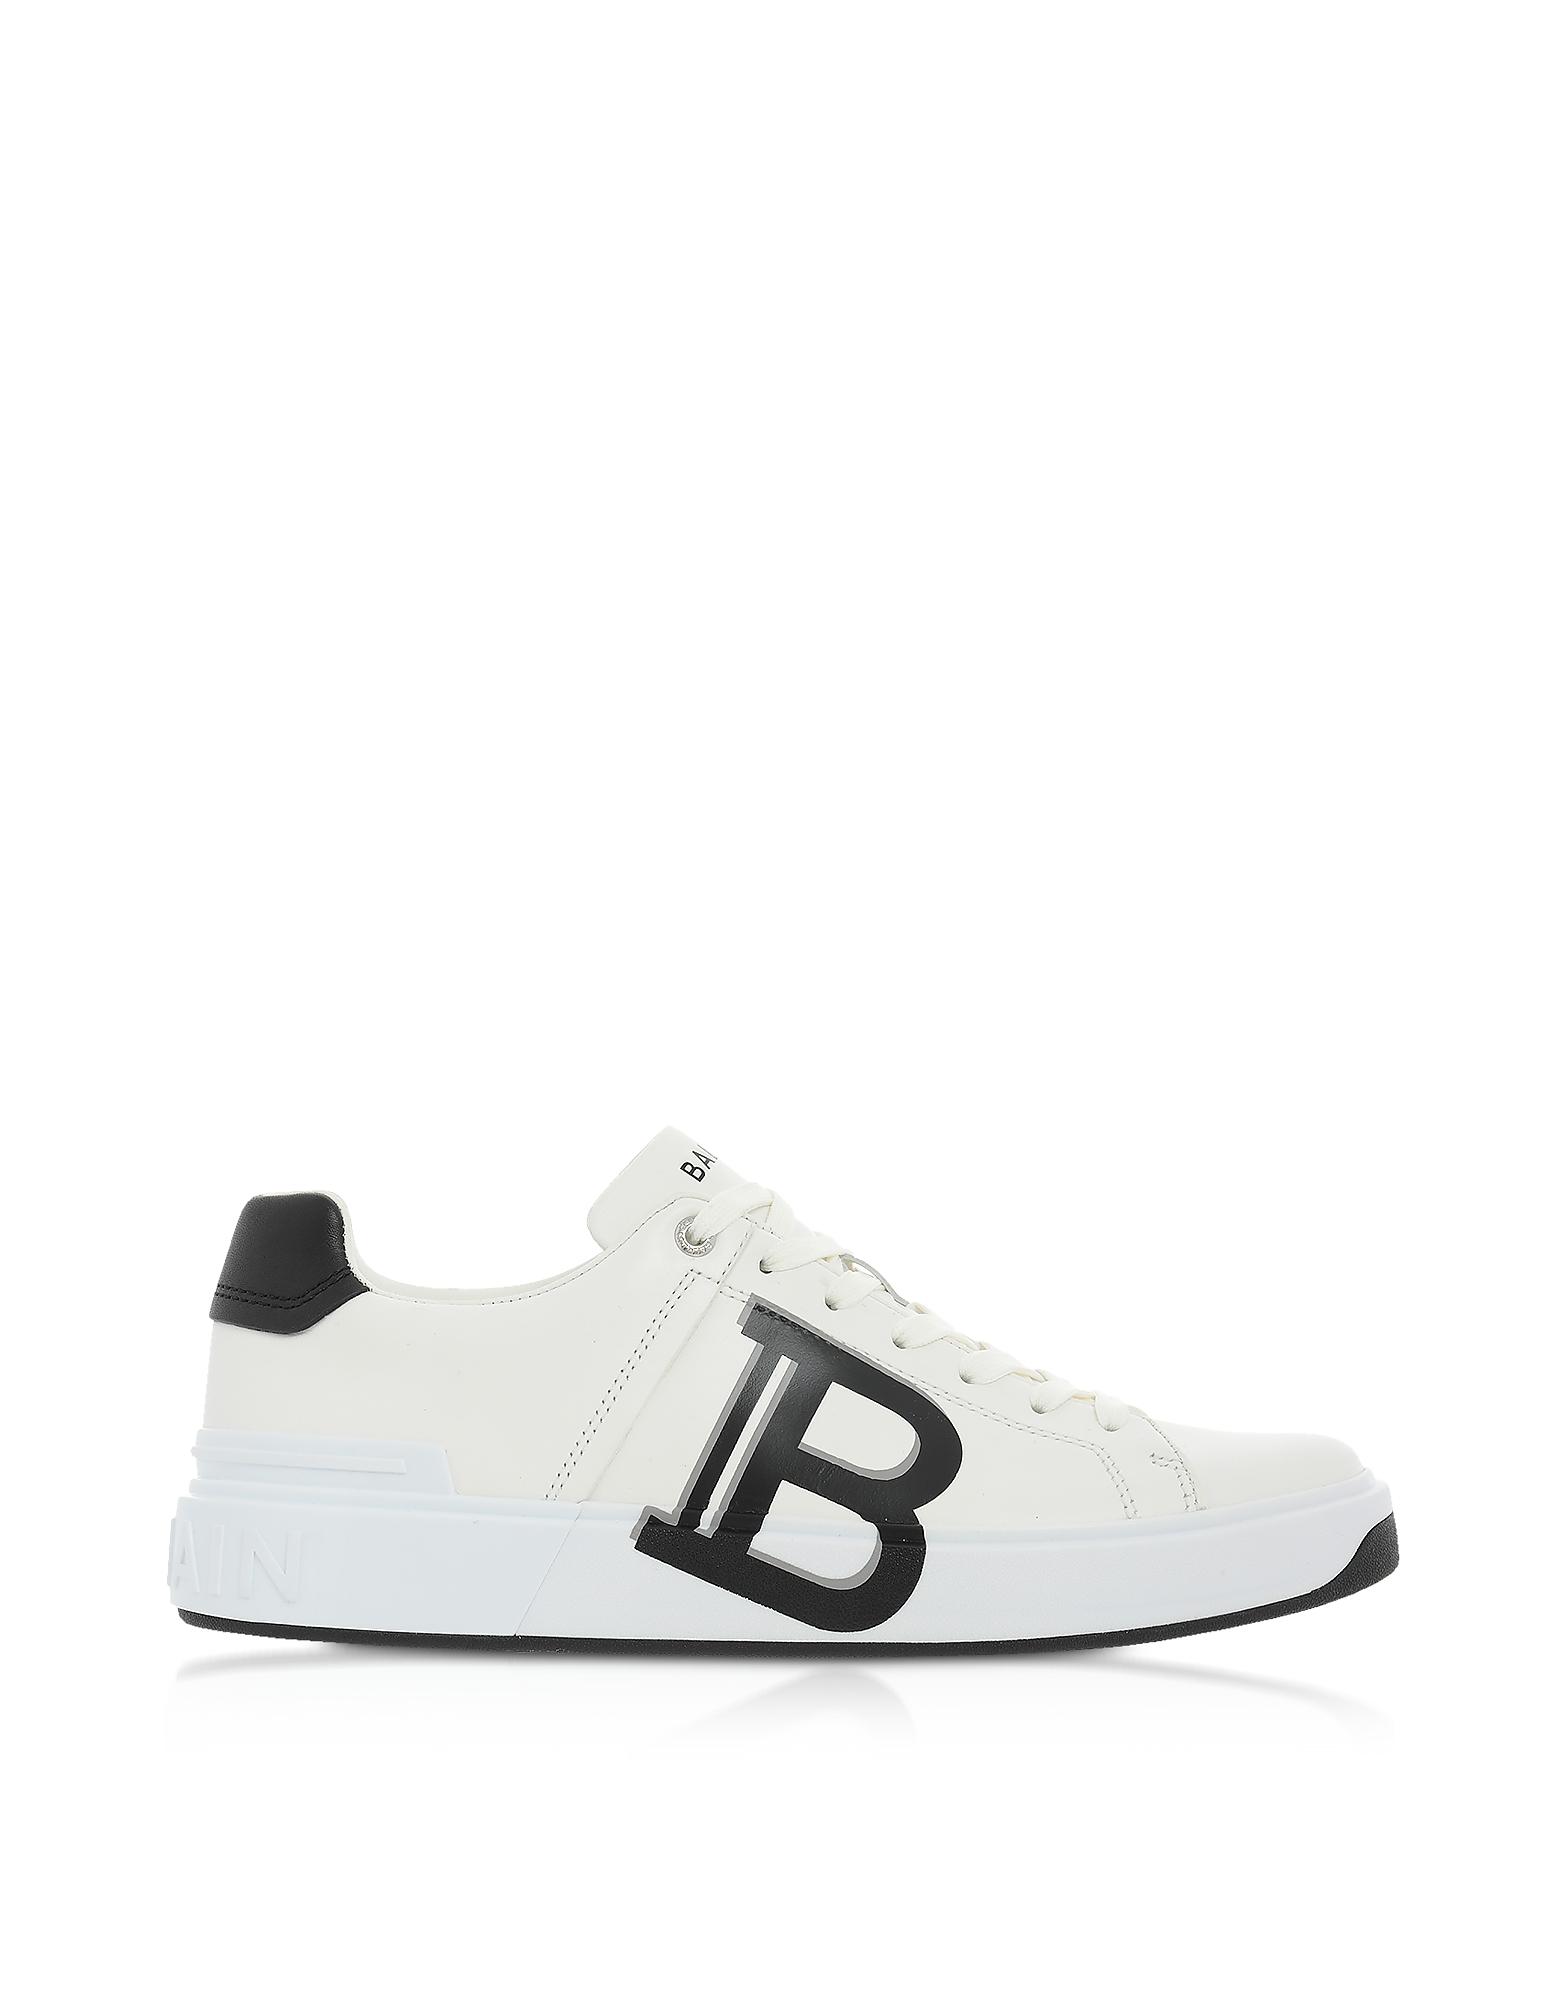 White & Black Low Top Men's B-Court Signature Sneakers